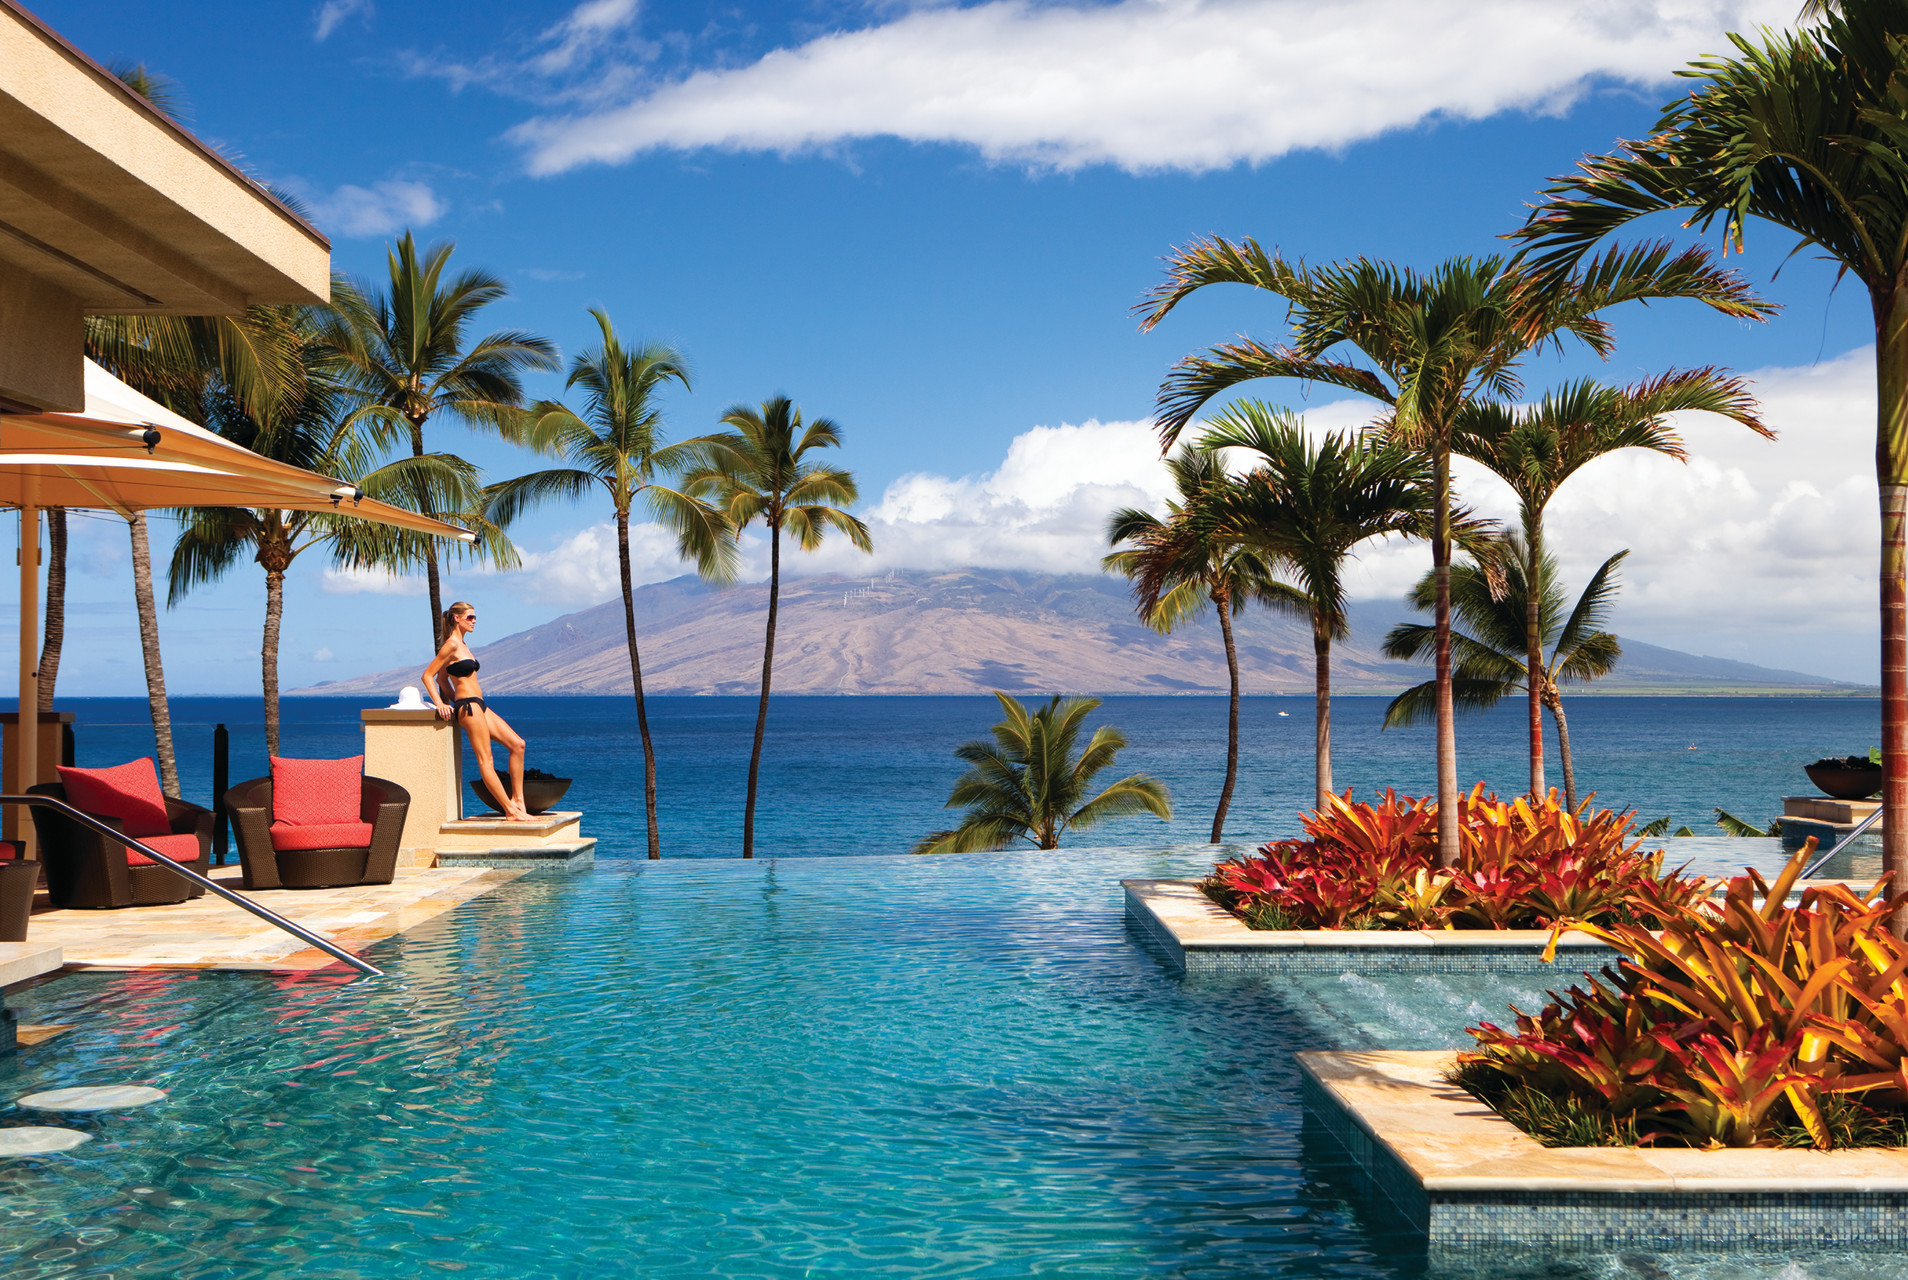 Four Seasons Resort Maui pool